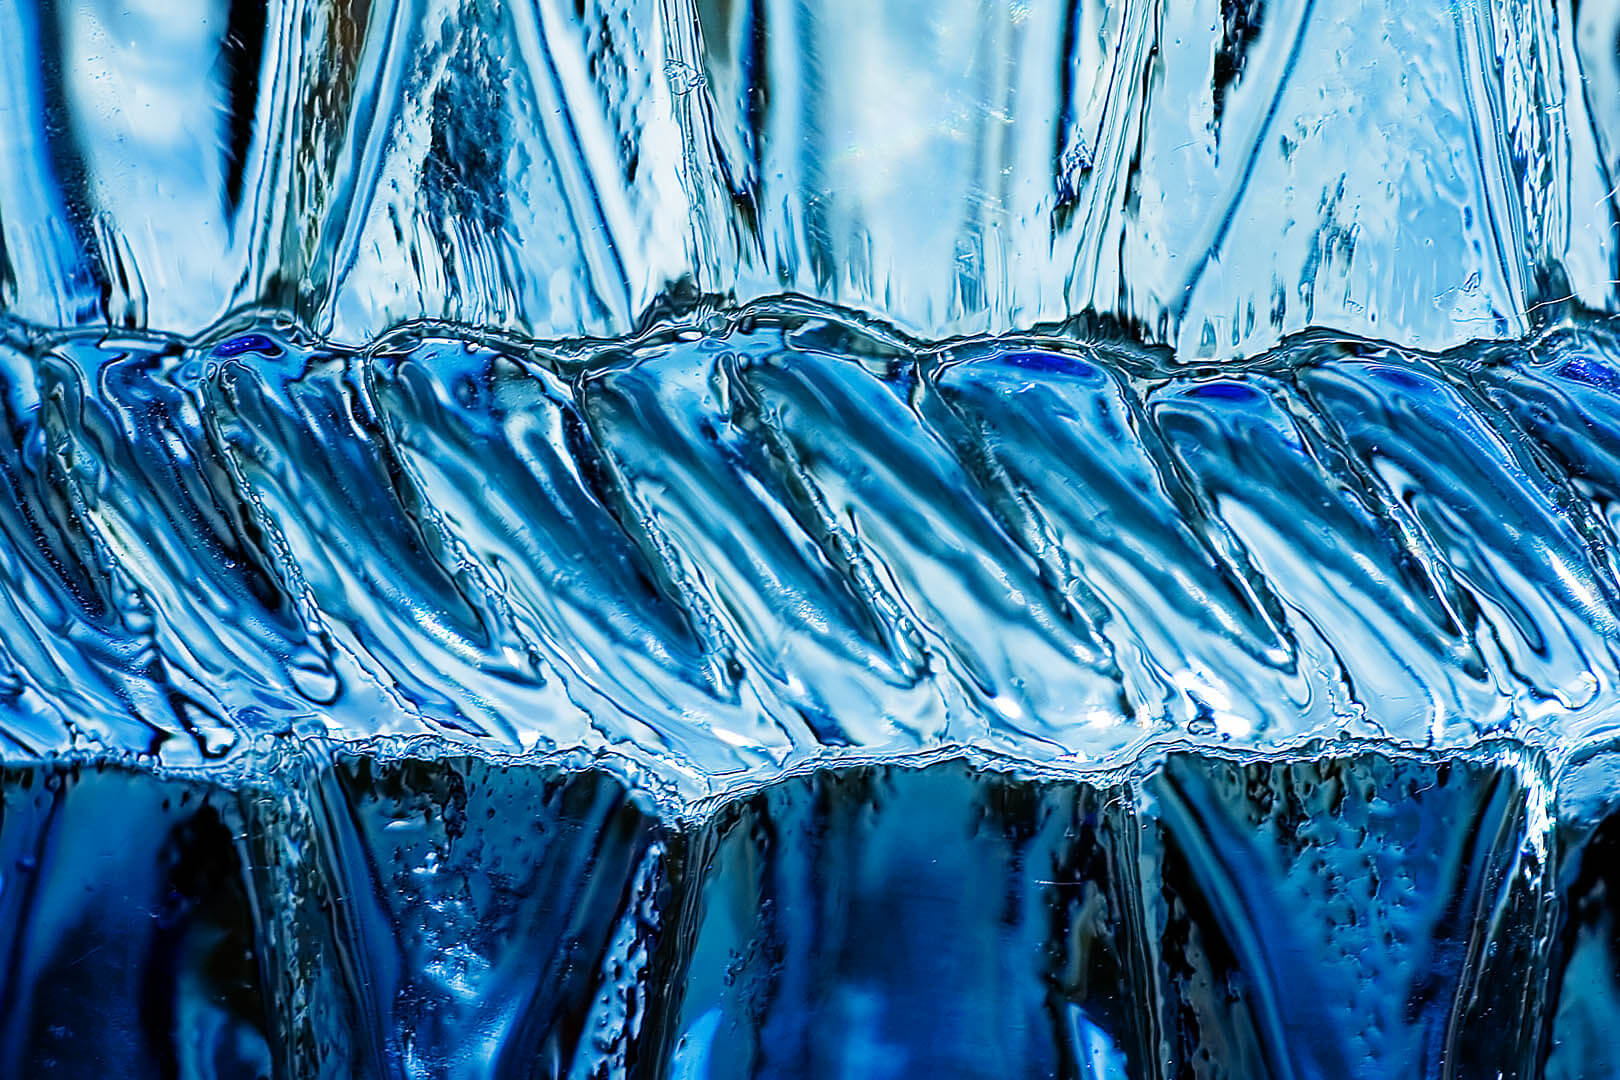 Blue Glass #2